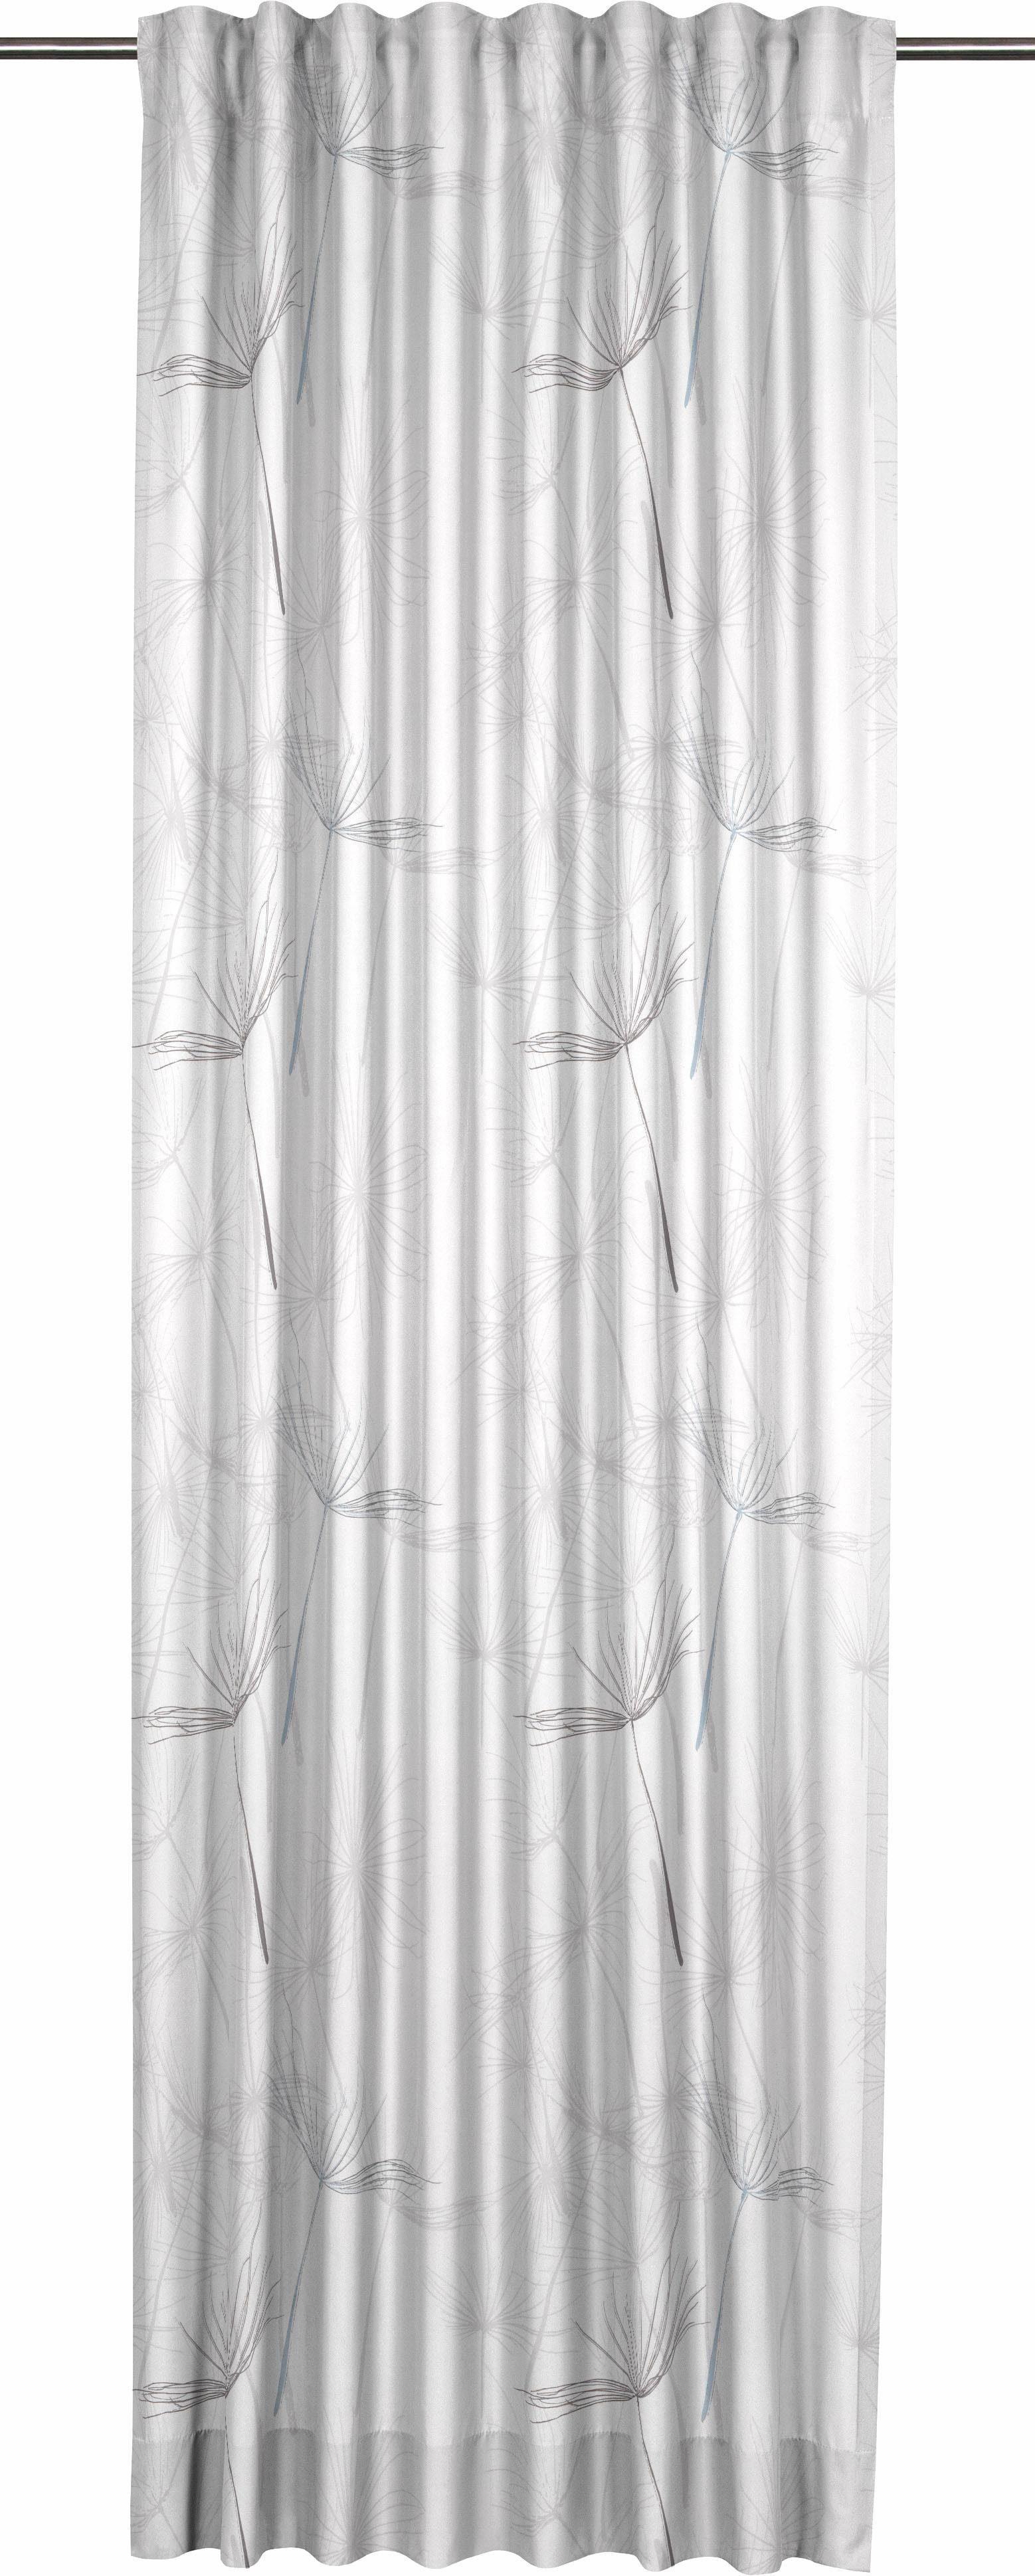 Vorhang »Solveig«, Gardisette, Multifunktionsband (1 Stück)